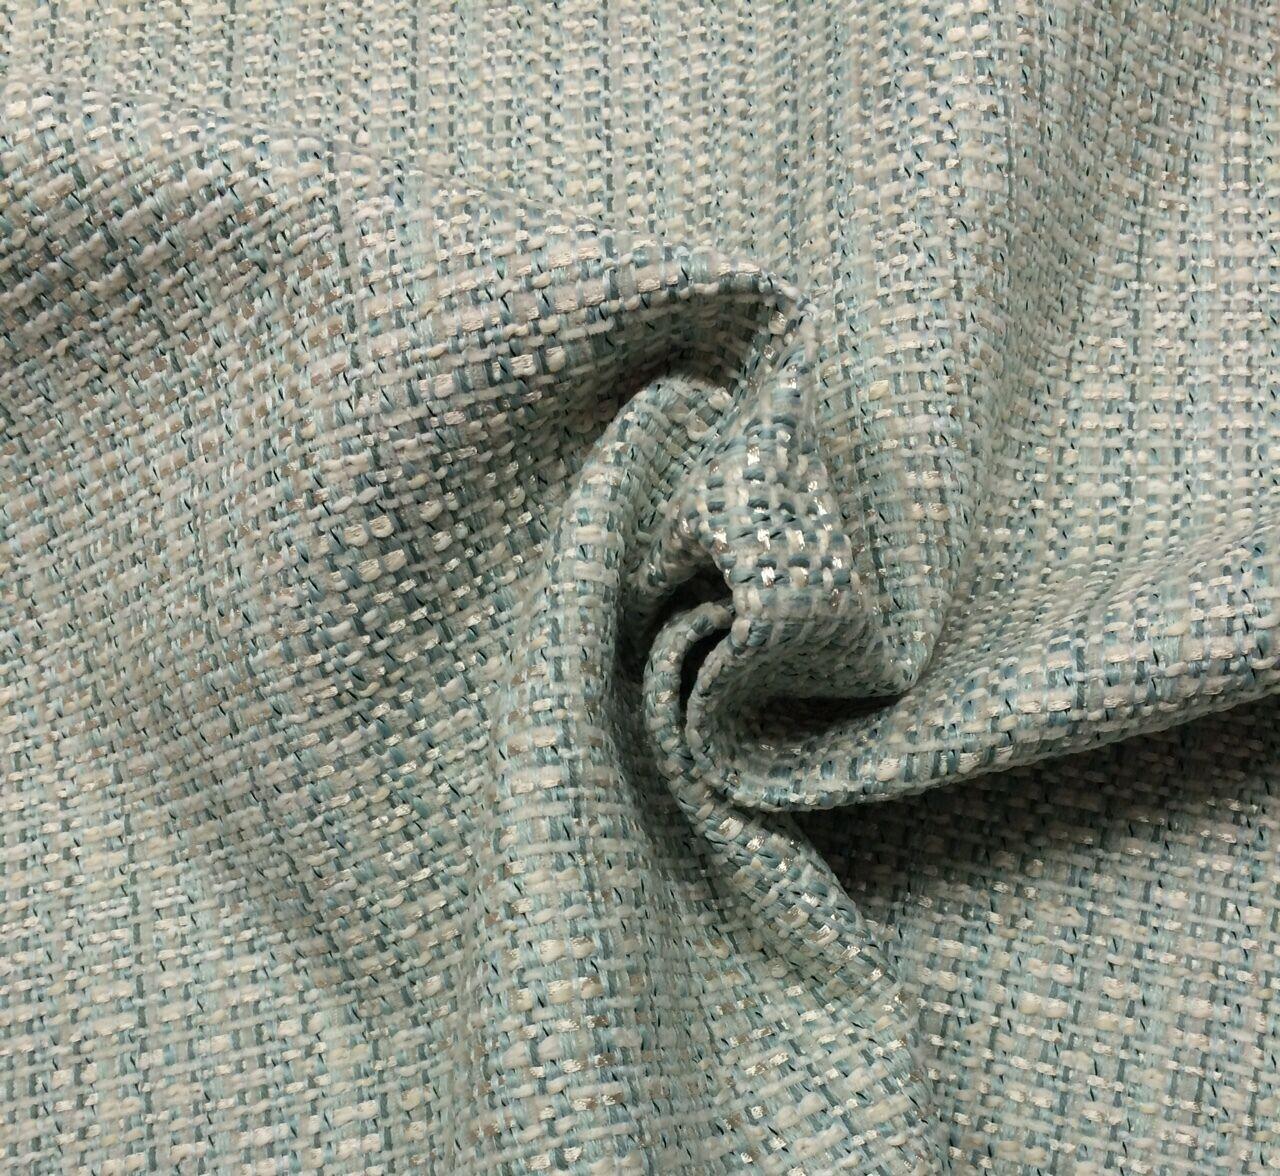 100 ballard design customer service 85 patio and outdoor ballard design customer service ballard designs coco tweed mineral blue metallic threads fabric by